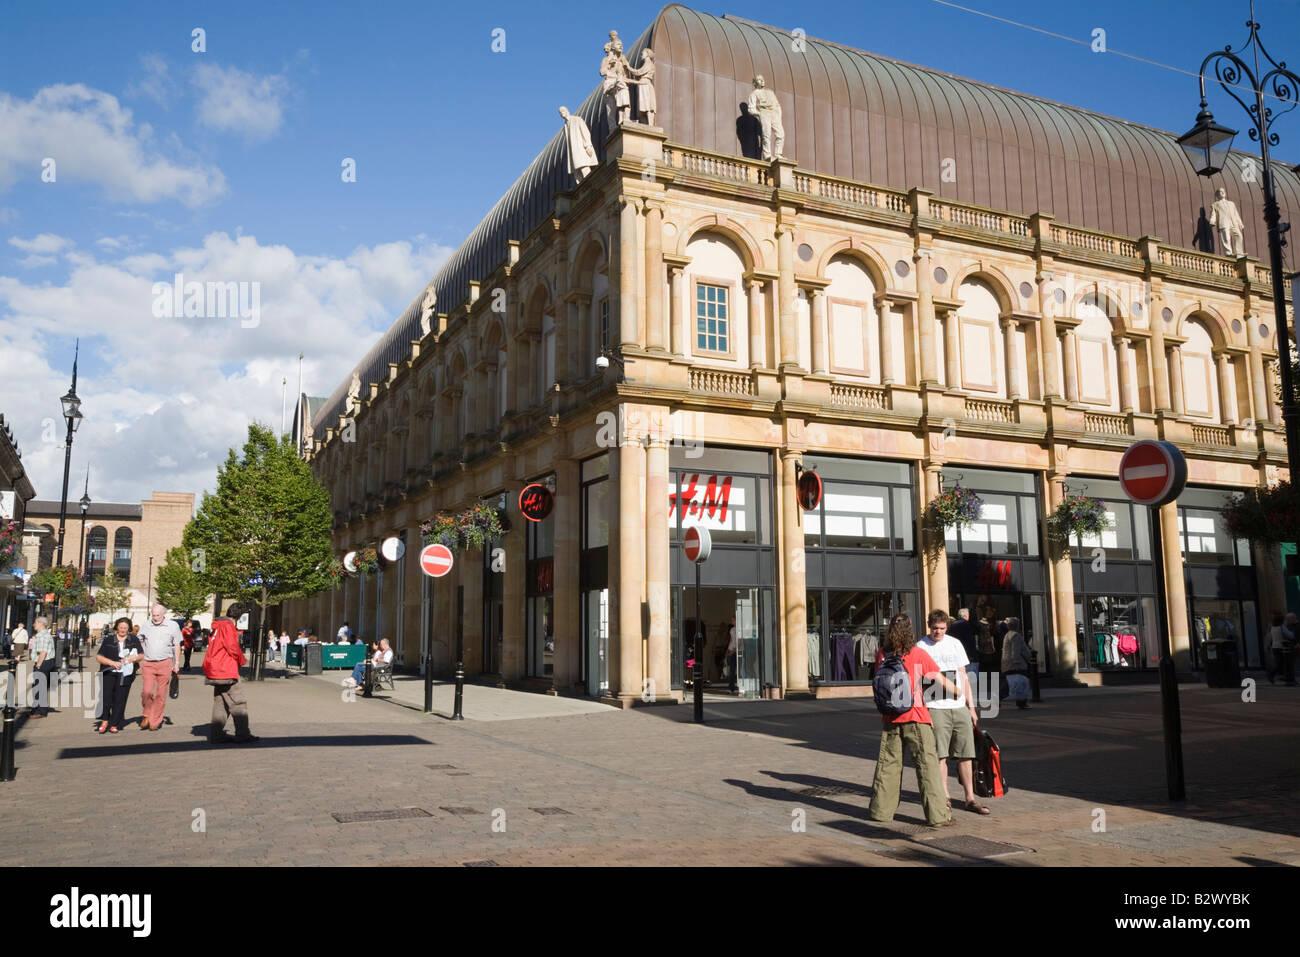 Harrogate Yorkshire England UK Victoria shopping centre building exterior and pedestrian precinct in town centre - Stock Image